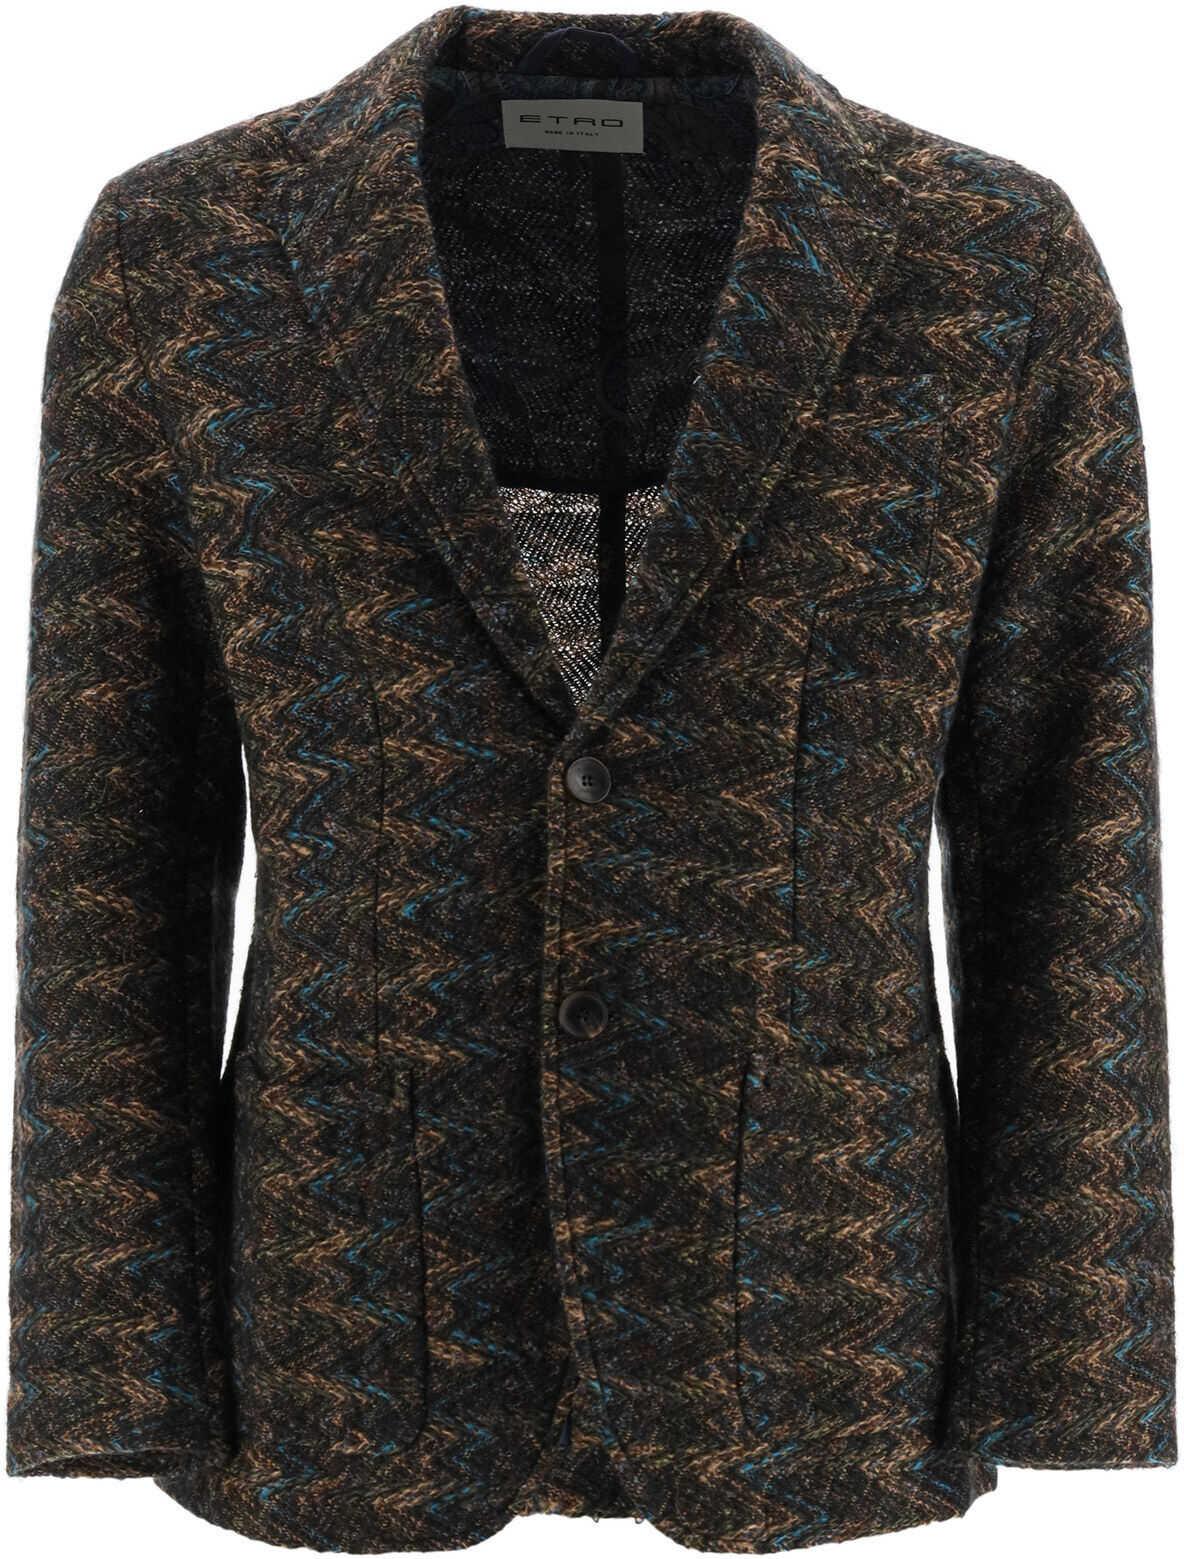 ETRO Jacquard Knit Blazer MARRONE imagine